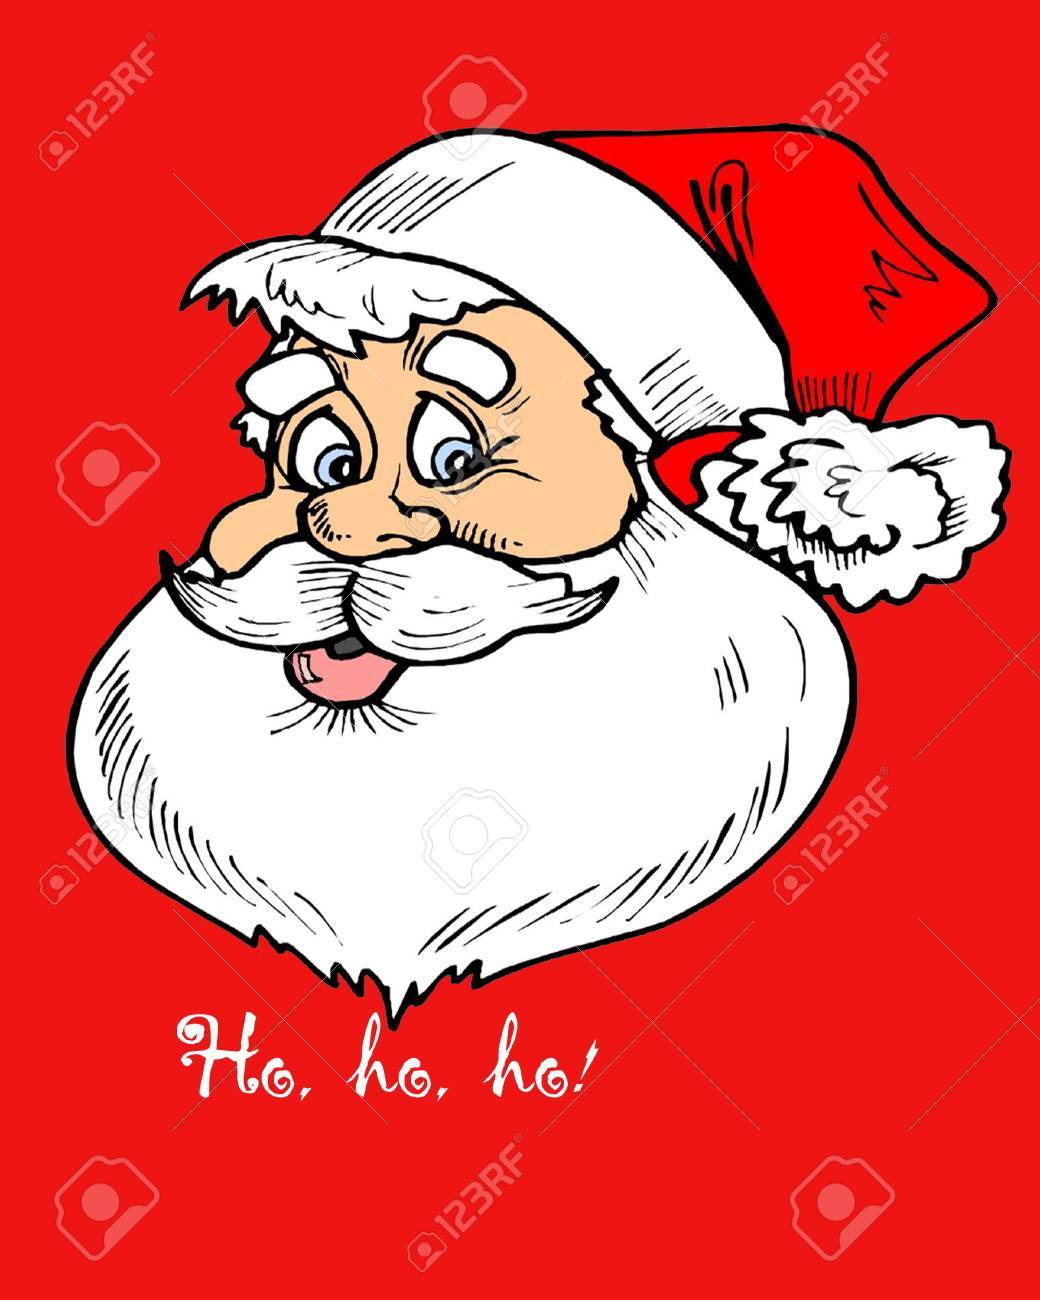 Babbo Natale Ho Ho Ho.Babbo Natale Illustrazione